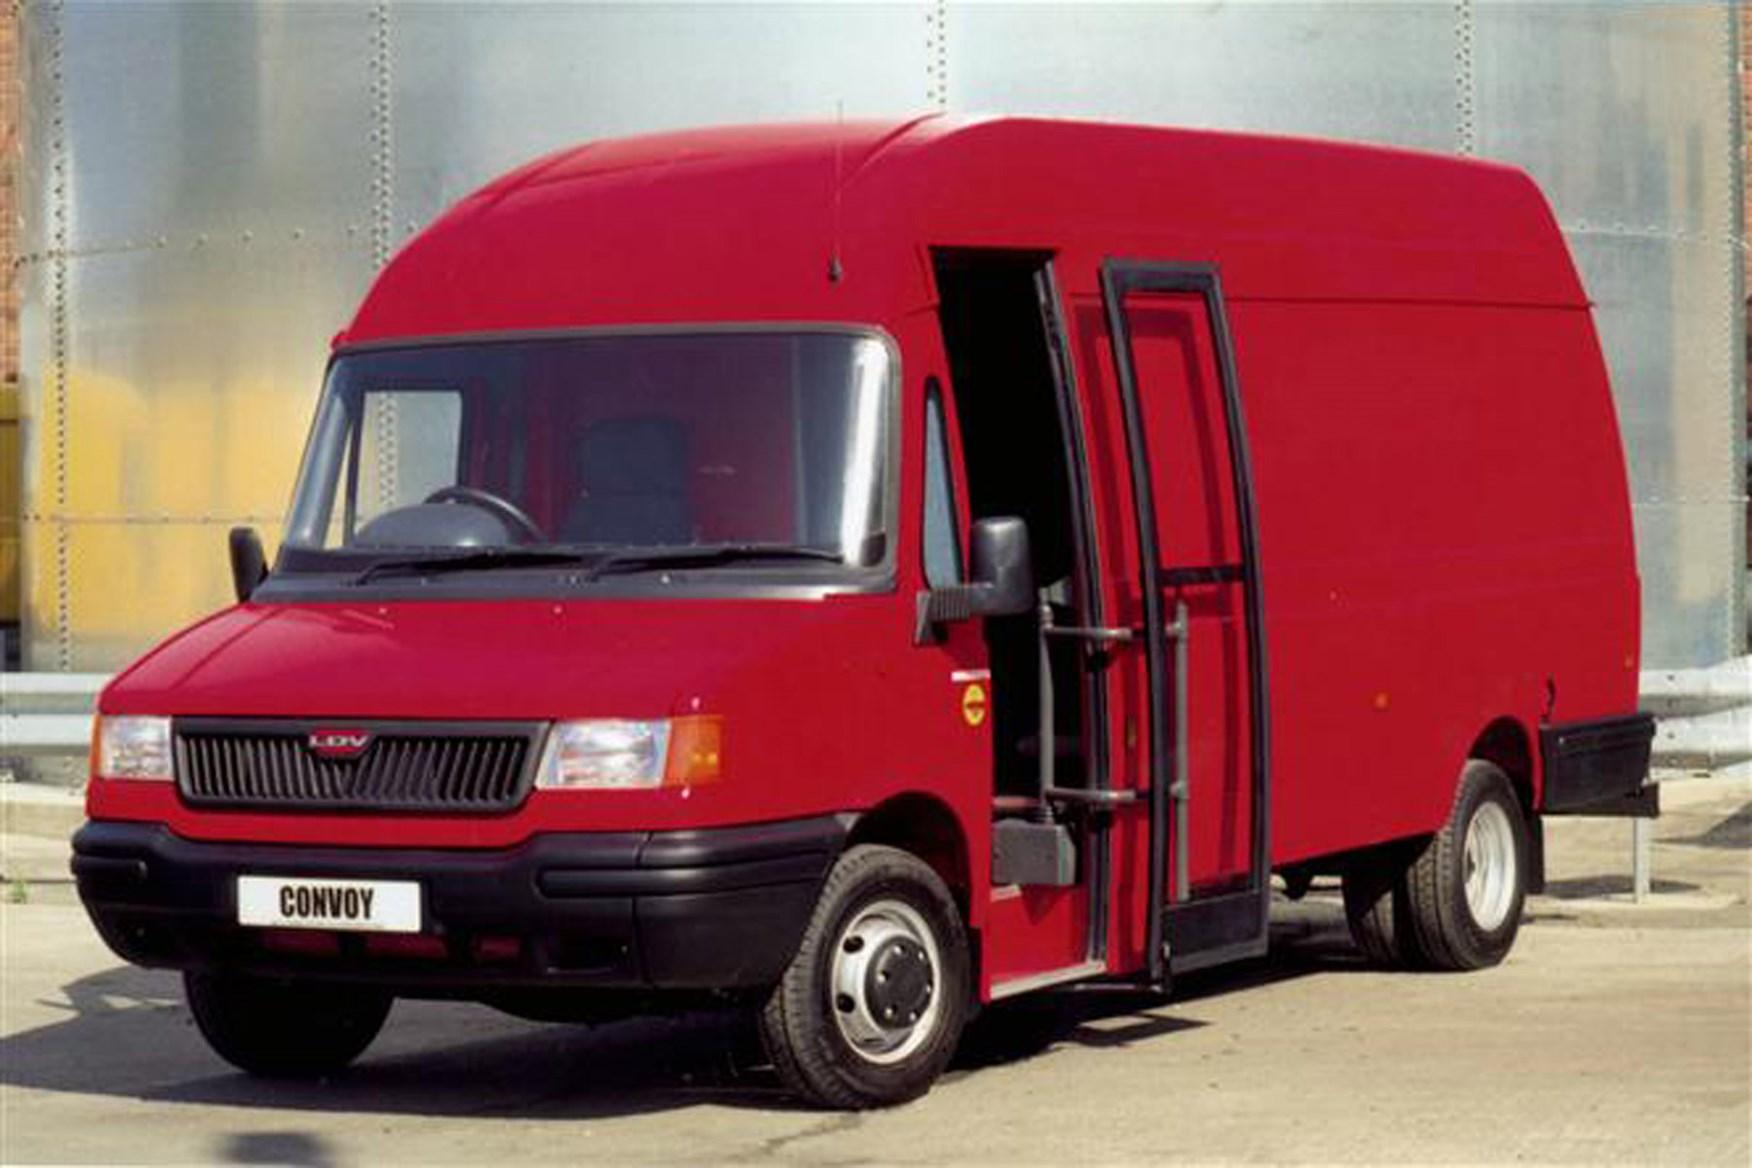 LDV Convoy review on Parkers Vans - exterior